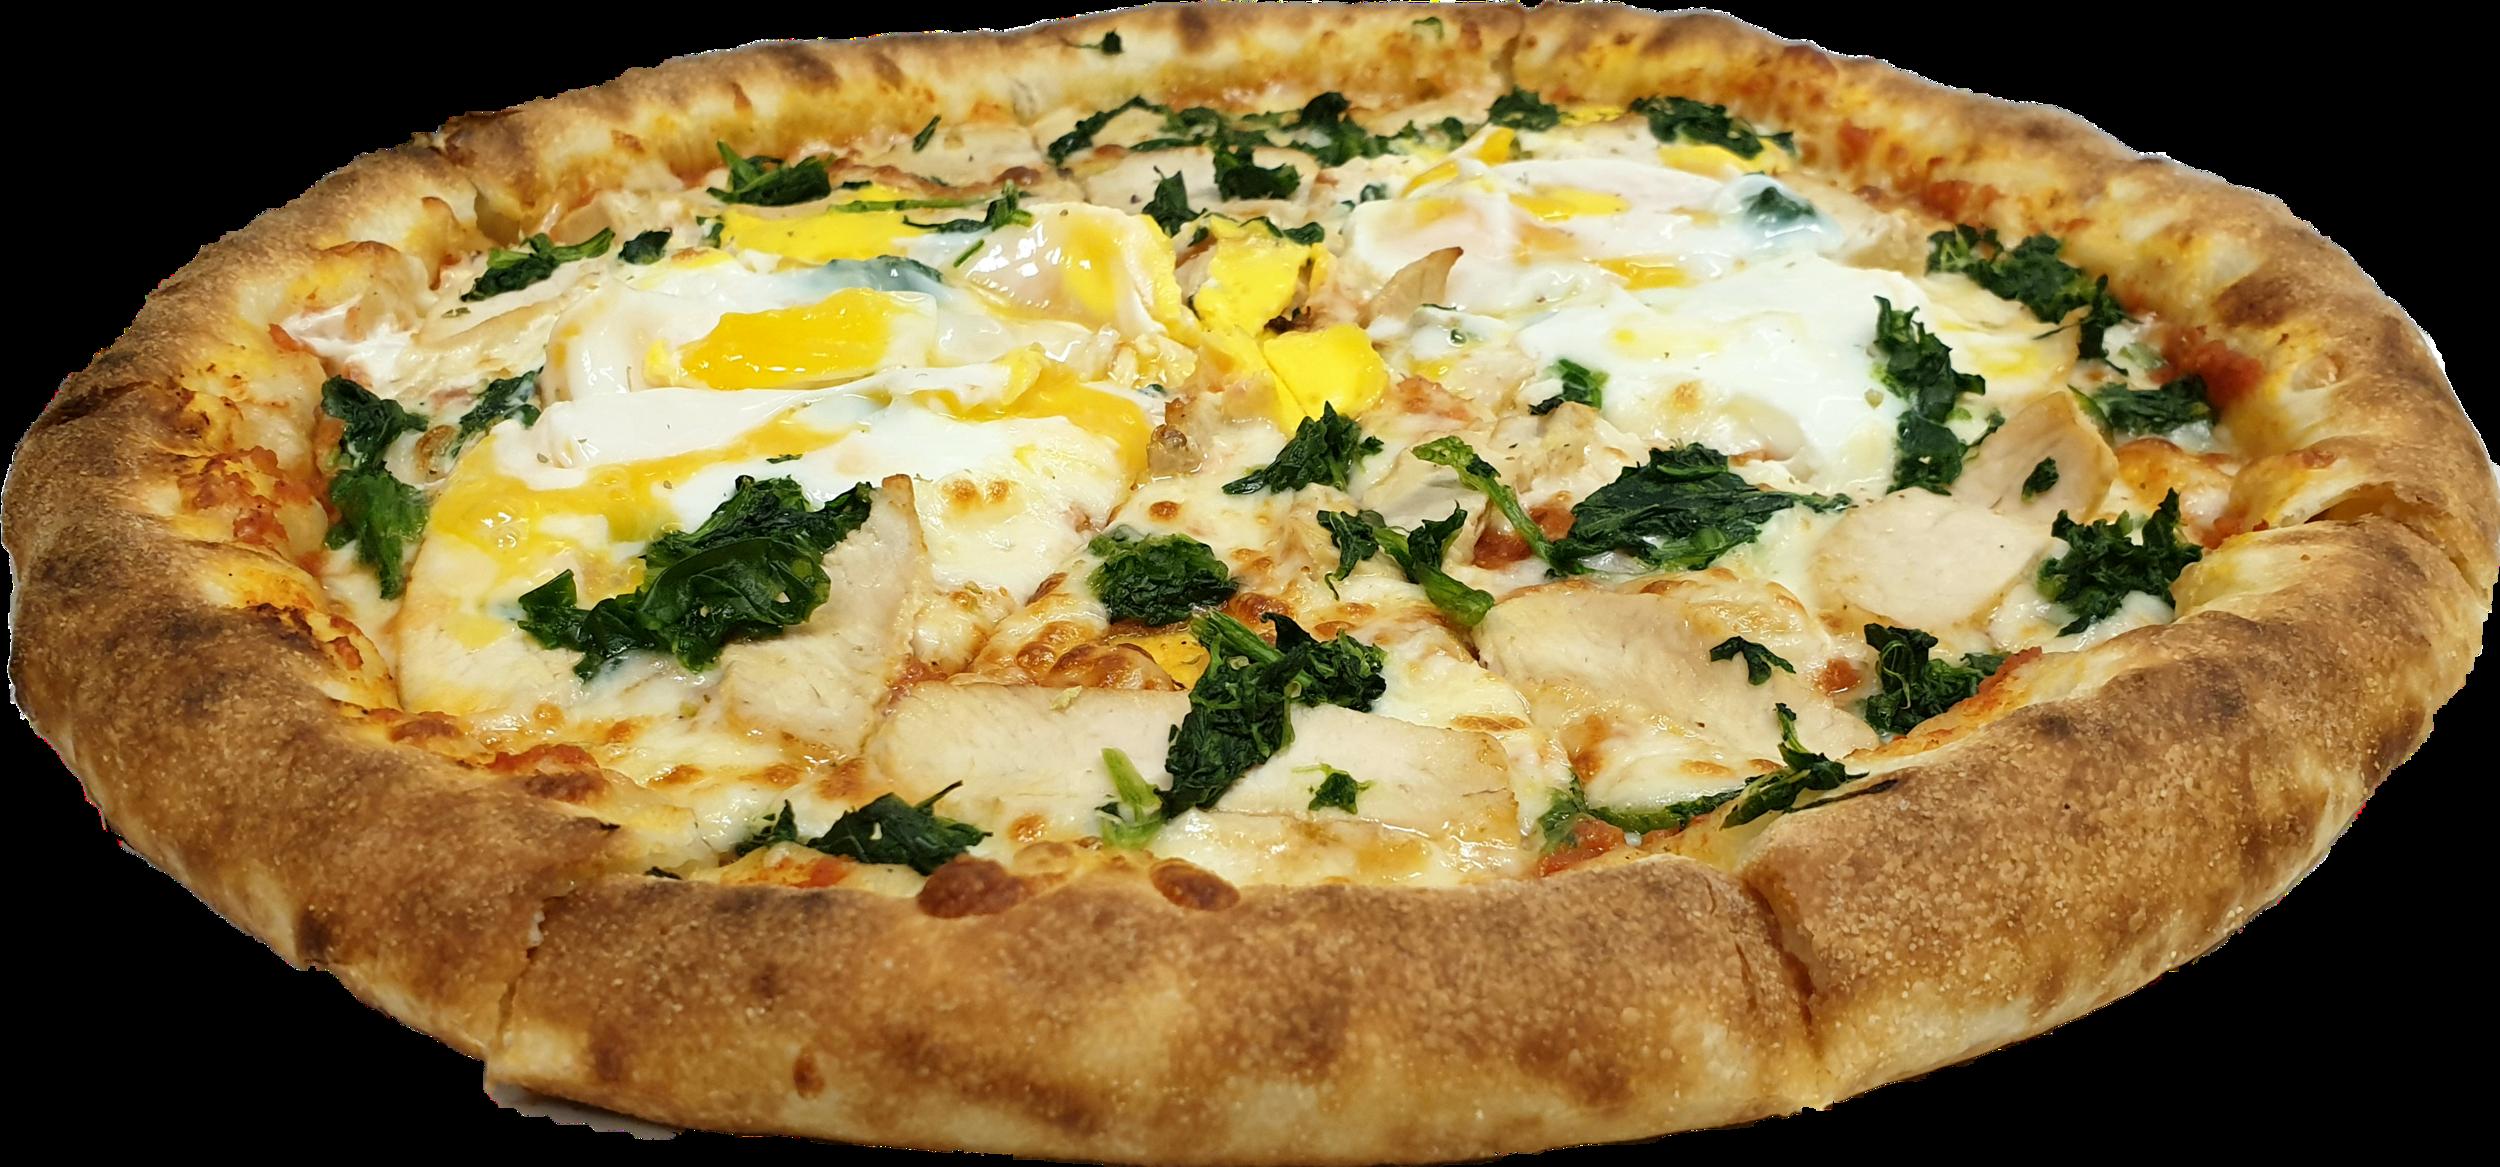 Tomatensauce, Mozzarella, Chicken, Eier, Spinat